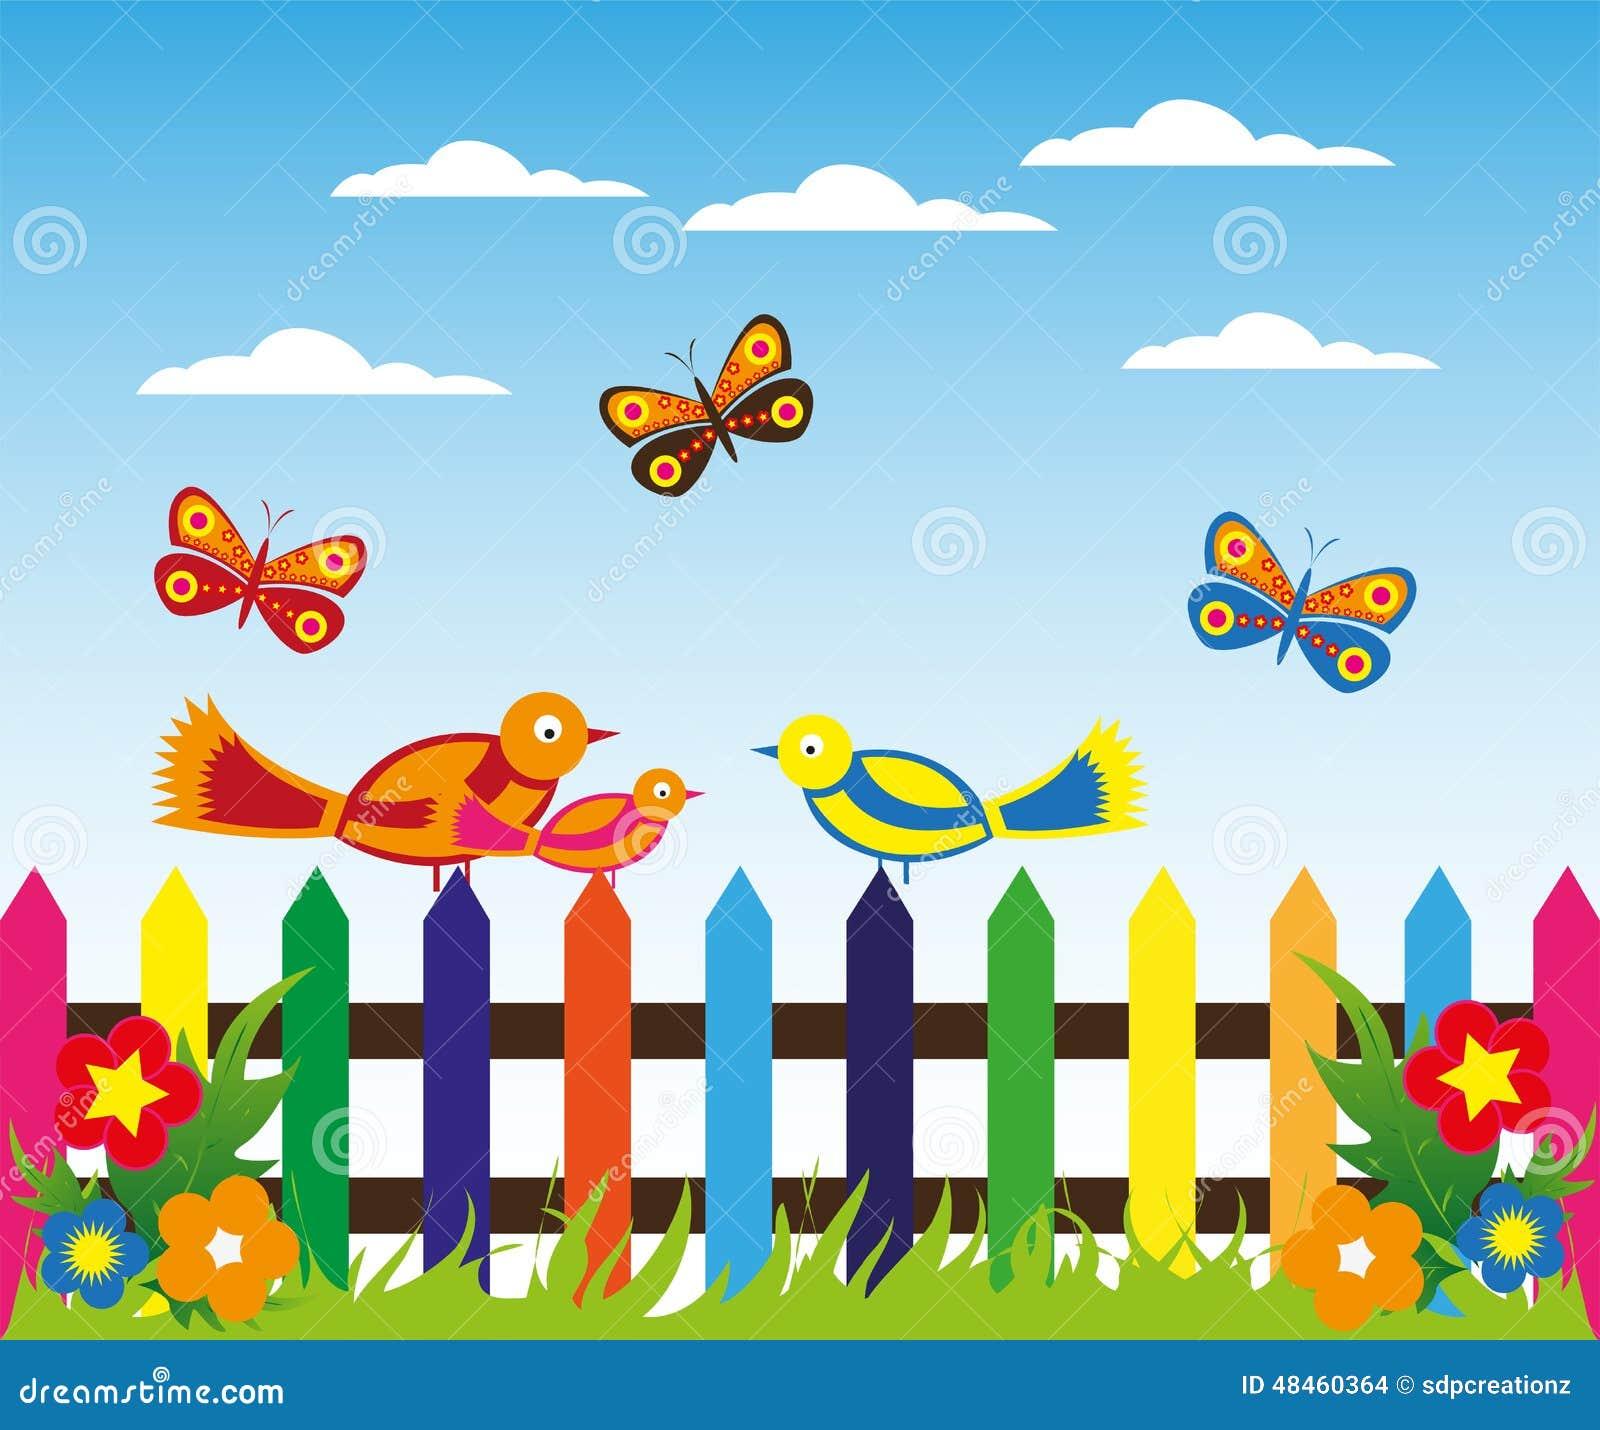 Garden Stock Image Image Of Design: Garden Fence Background Stock Illustration. Illustration